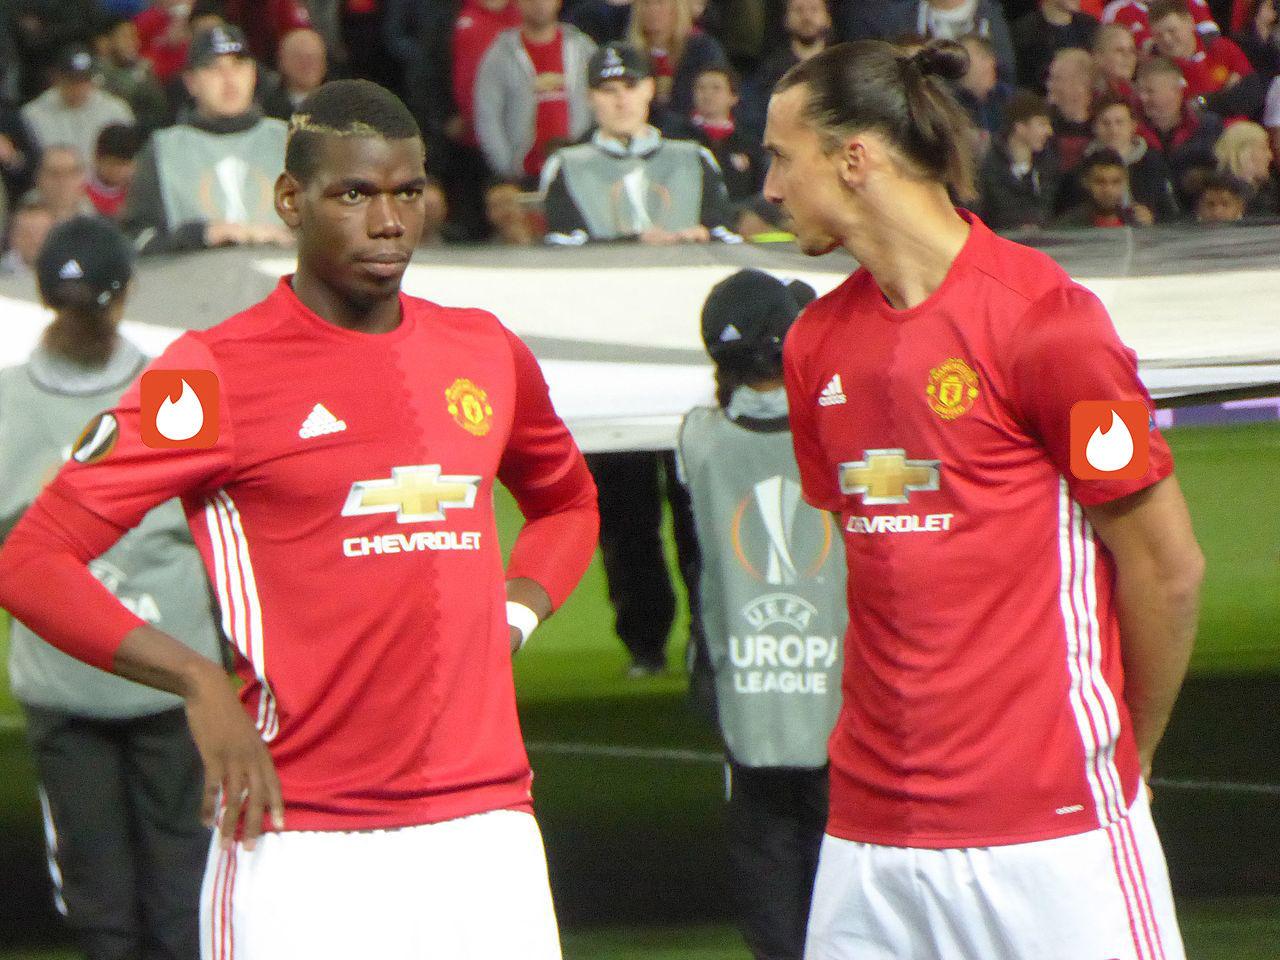 Tinder sägs sponsra Manchester United